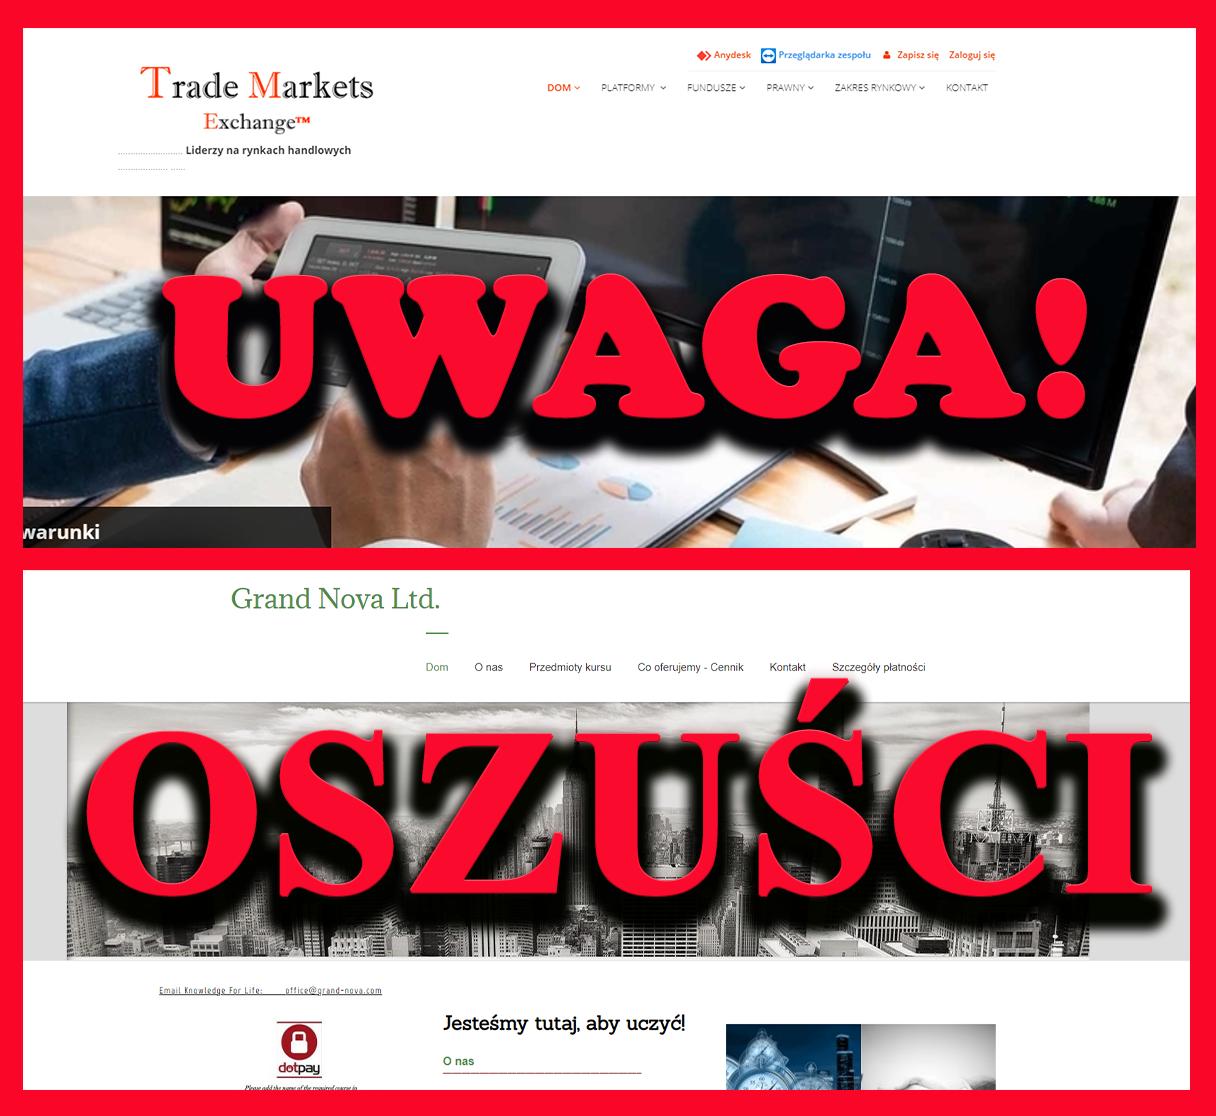 UWAGA OSZUŚCI!  GRAND NOWA & TRADE MARKETS/Exchange